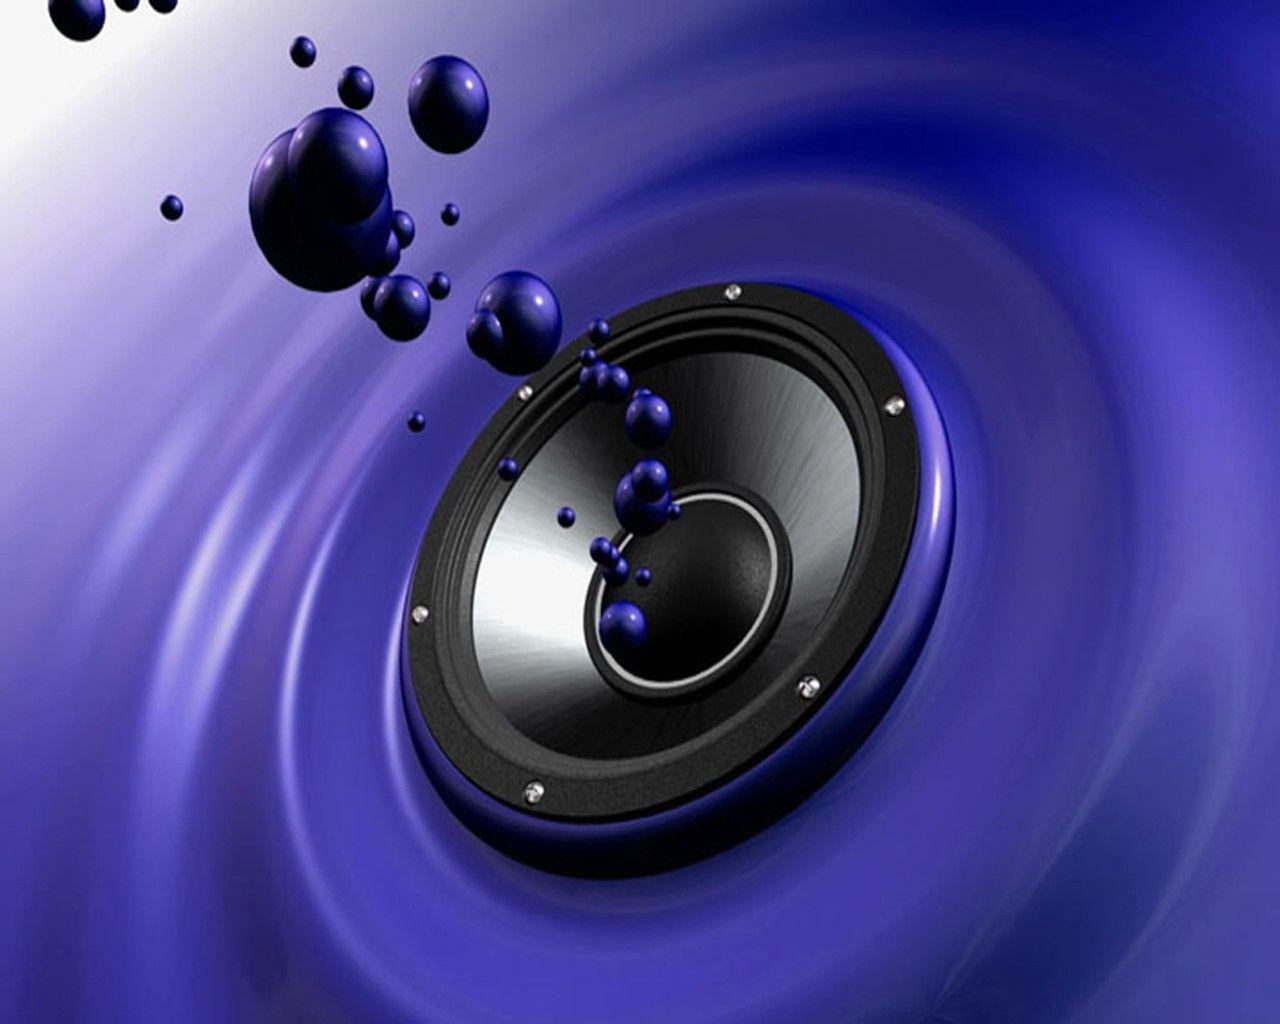 3d Wallpaper With Blue Loudspeaker Image